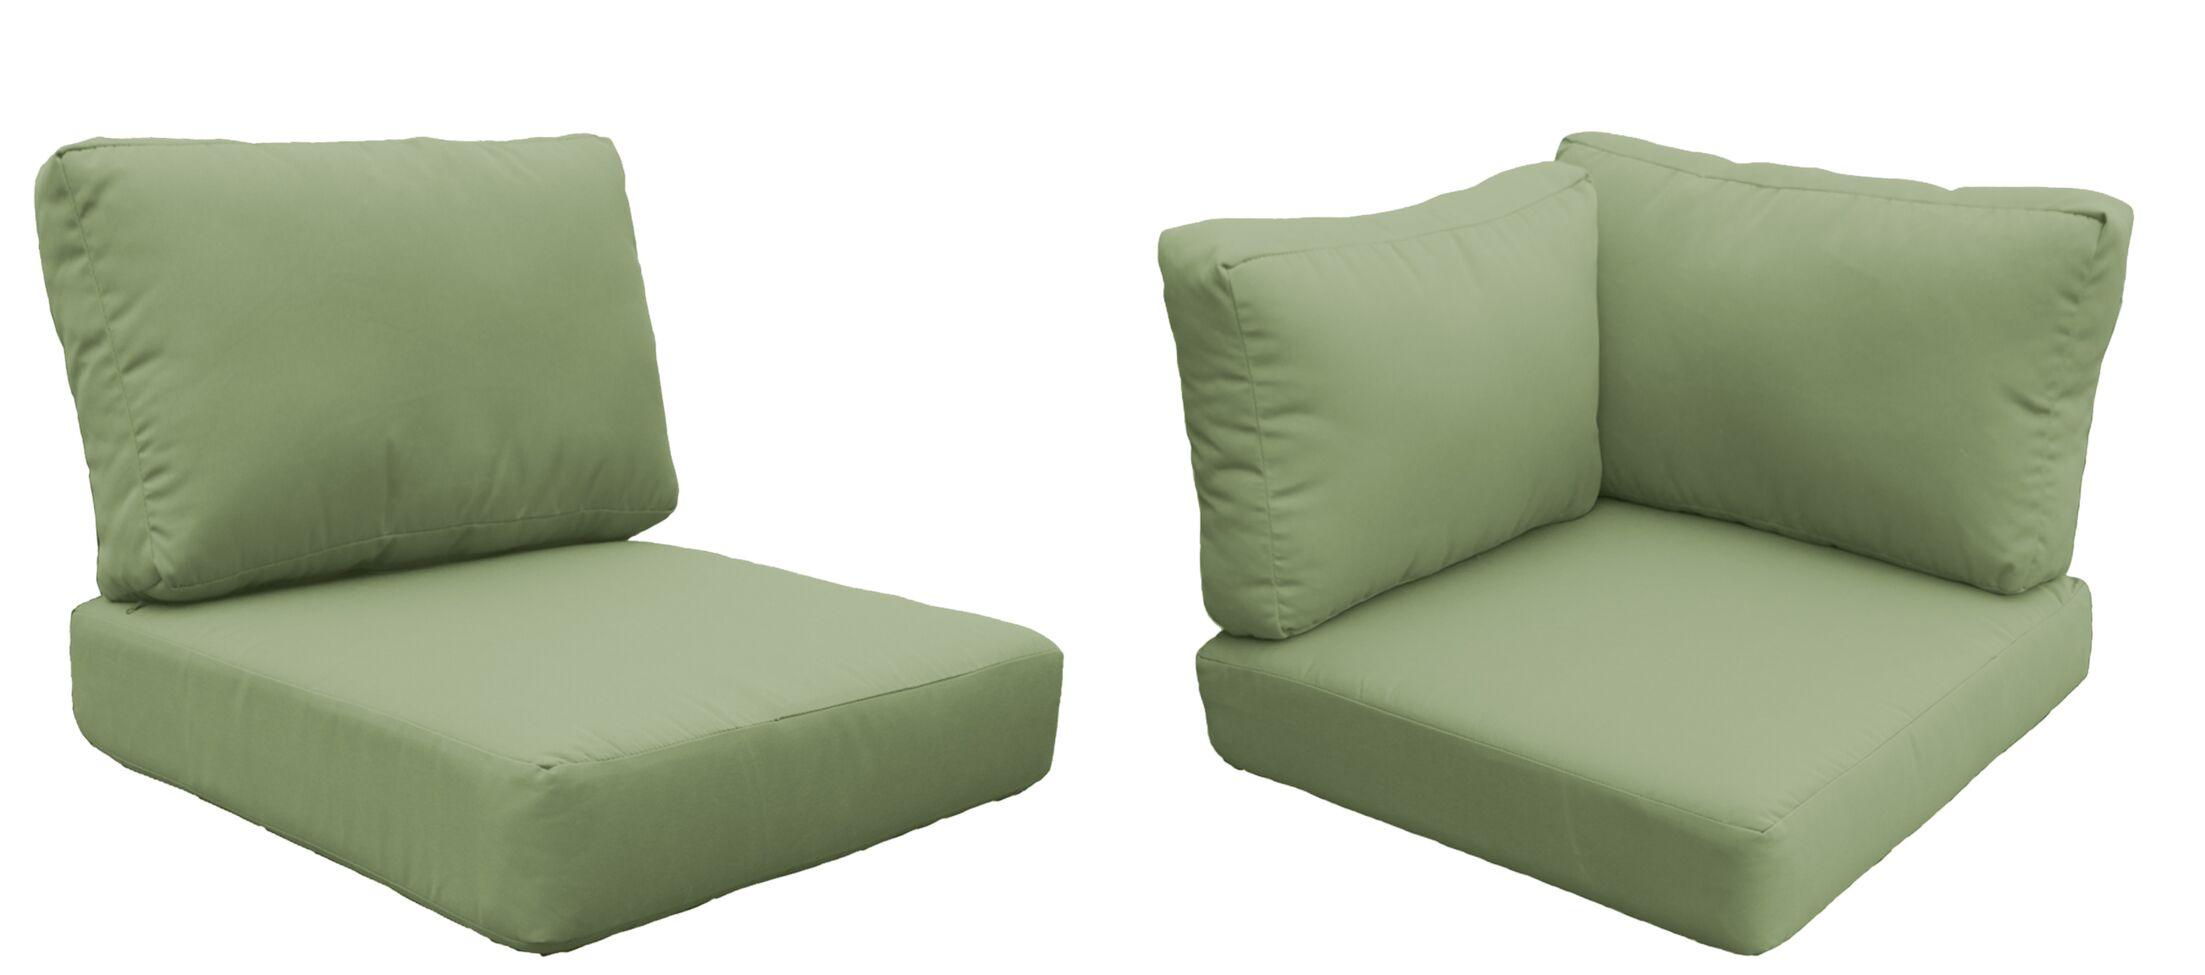 Miami 15 Piece Outdoor Cushion Set Fabric: Cilantro